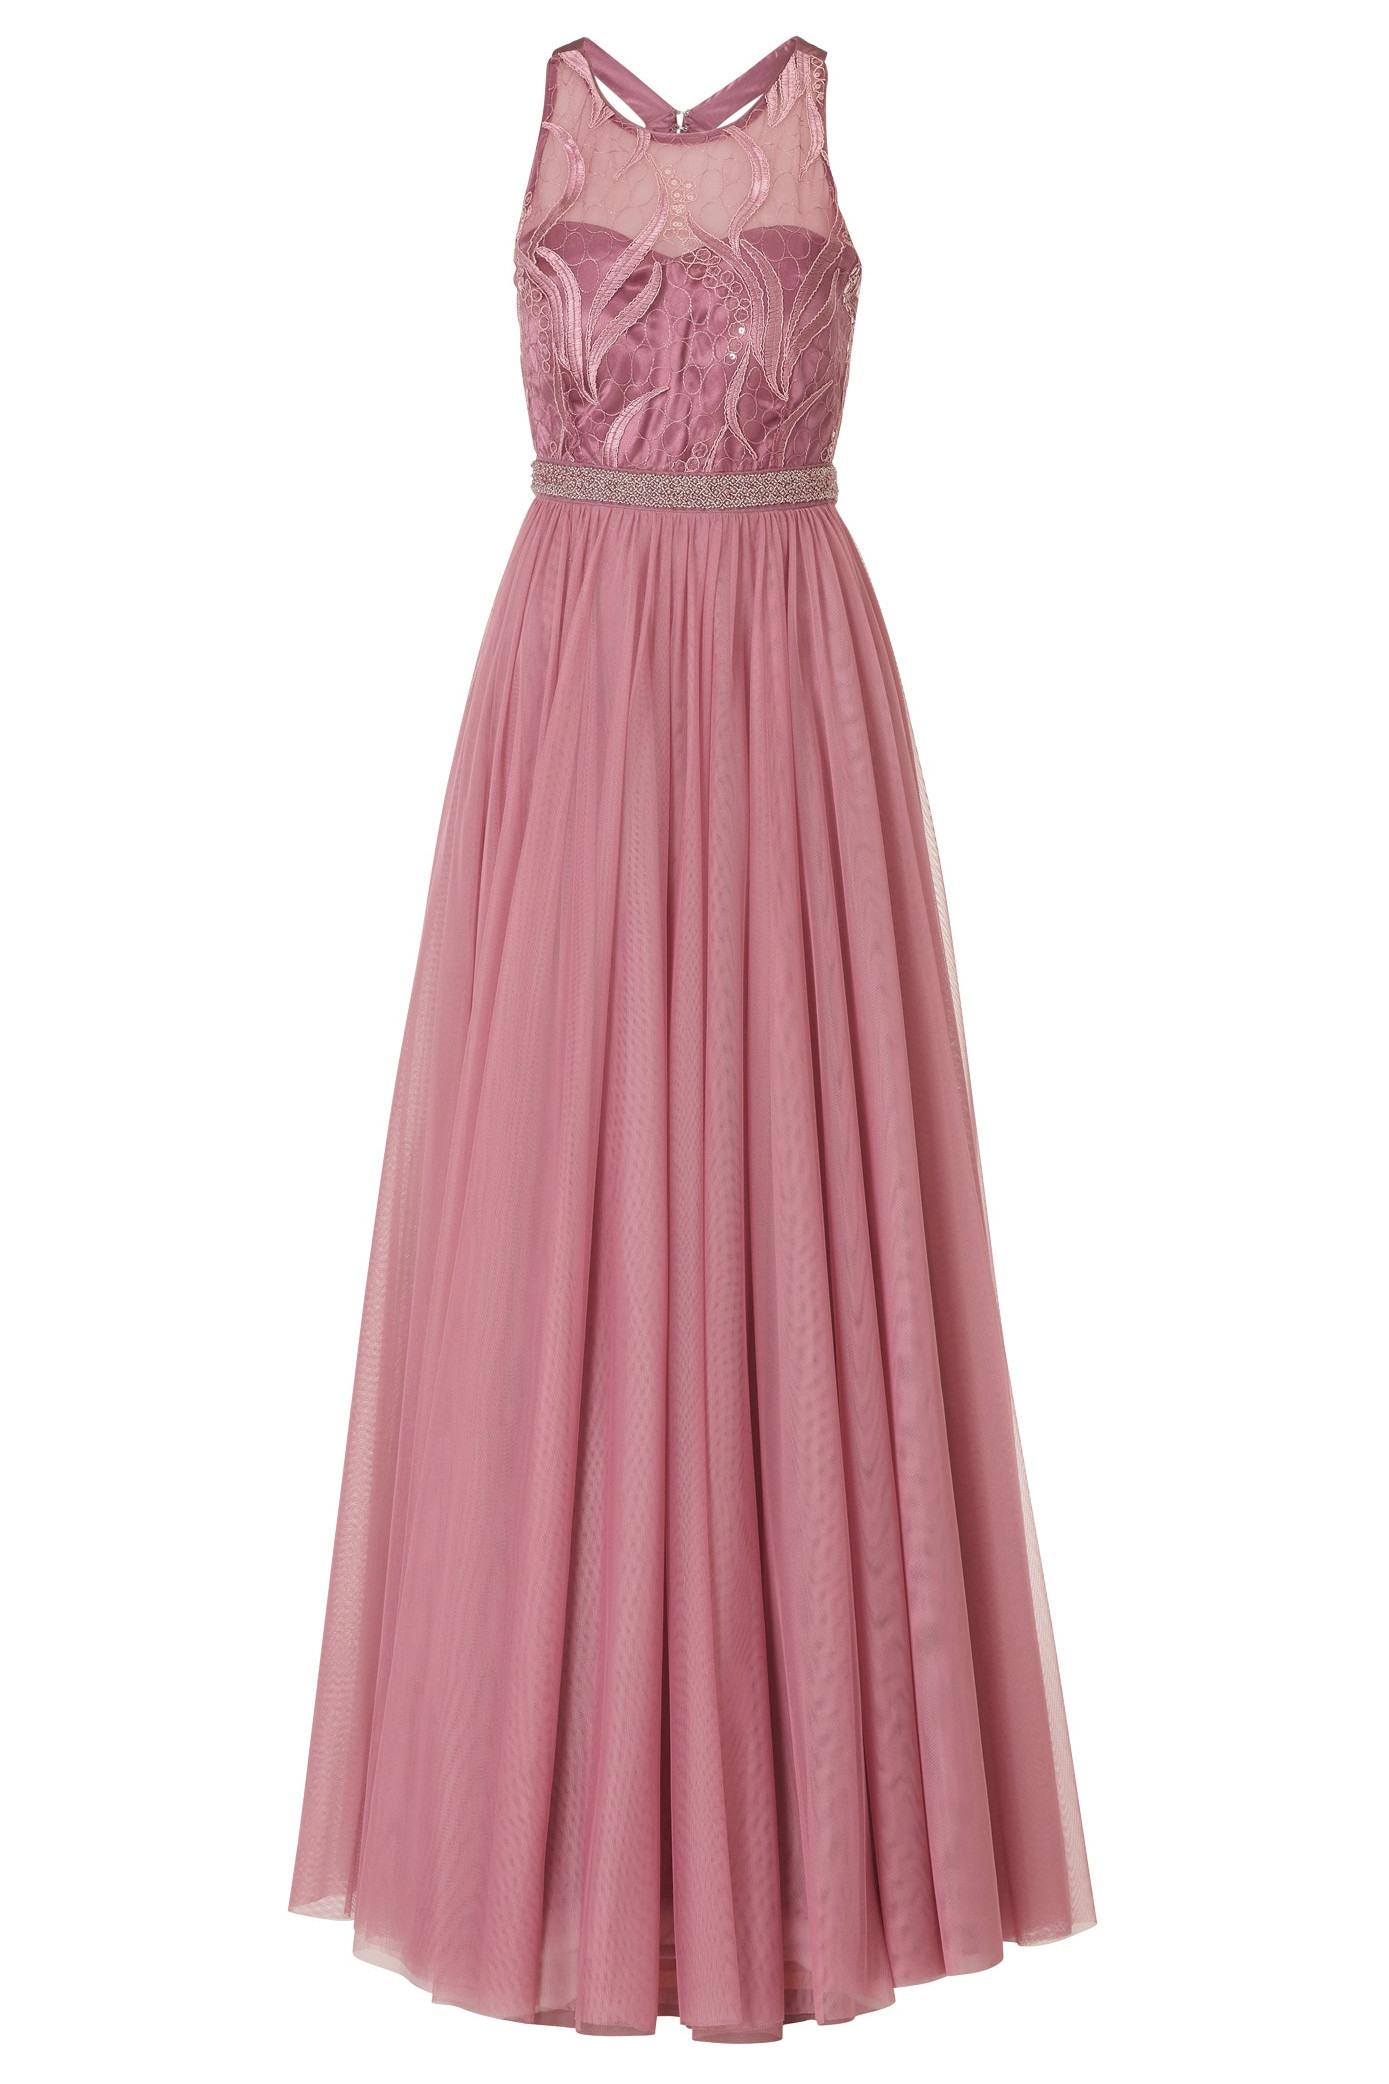 Wunderbar Abendkleid Altrosa Vertrieb17 Spektakulär Abendkleid Altrosa Design